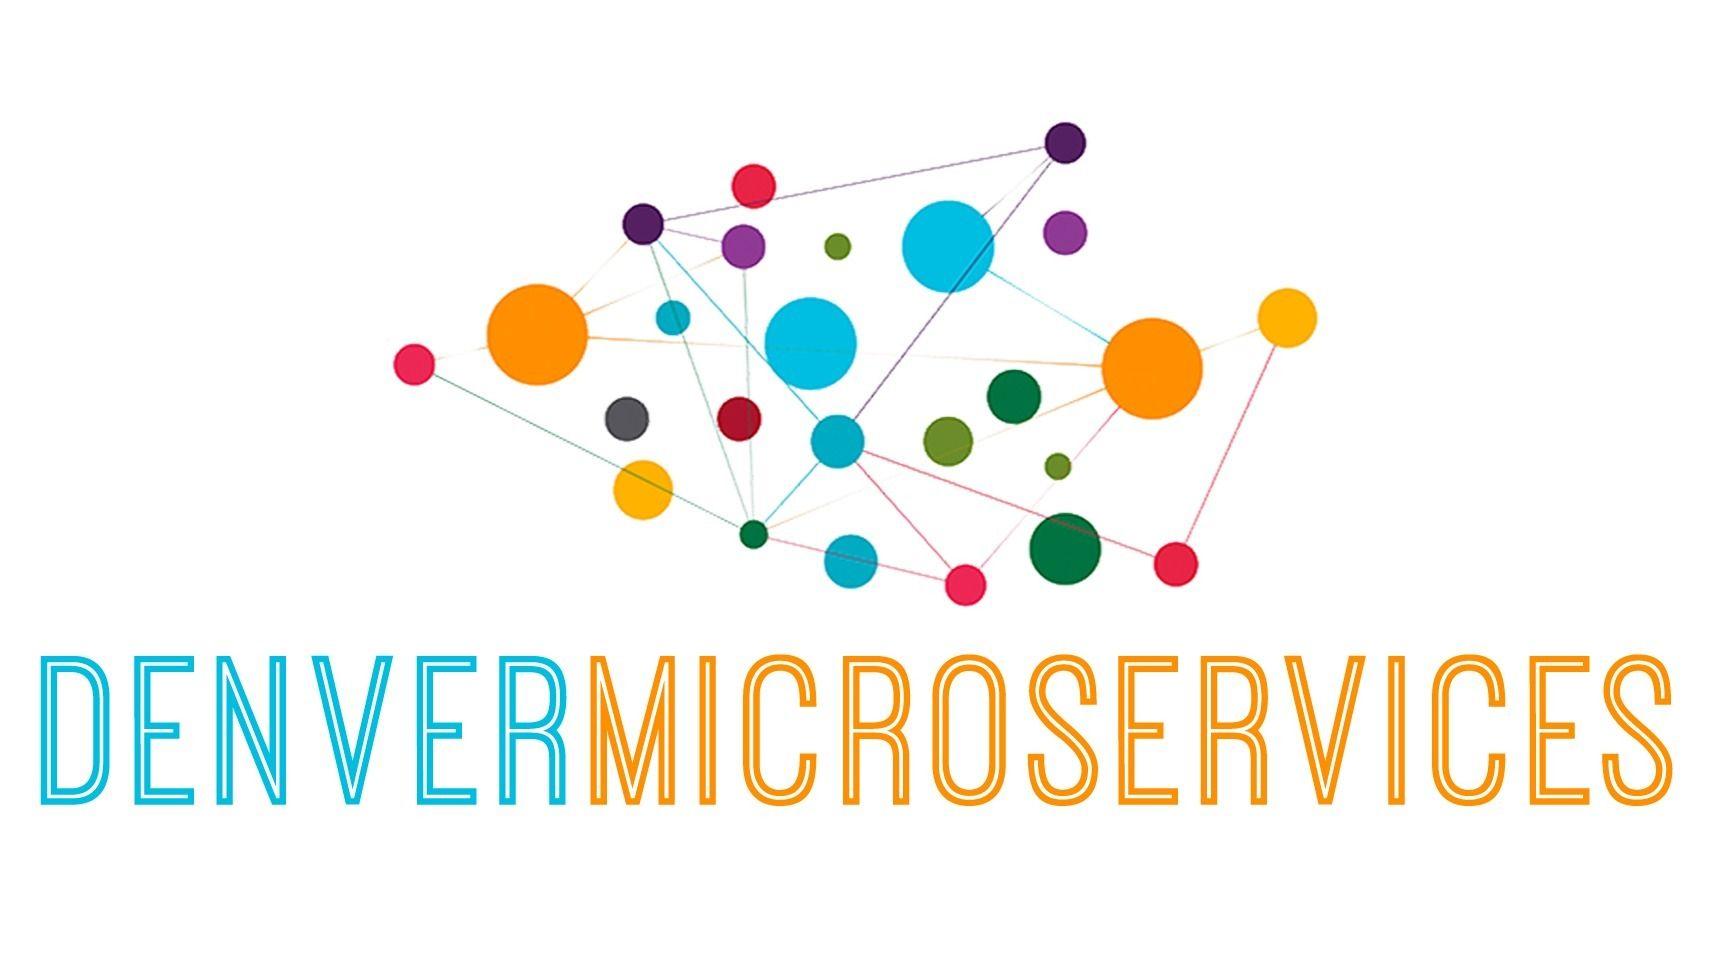 Denver Microservices